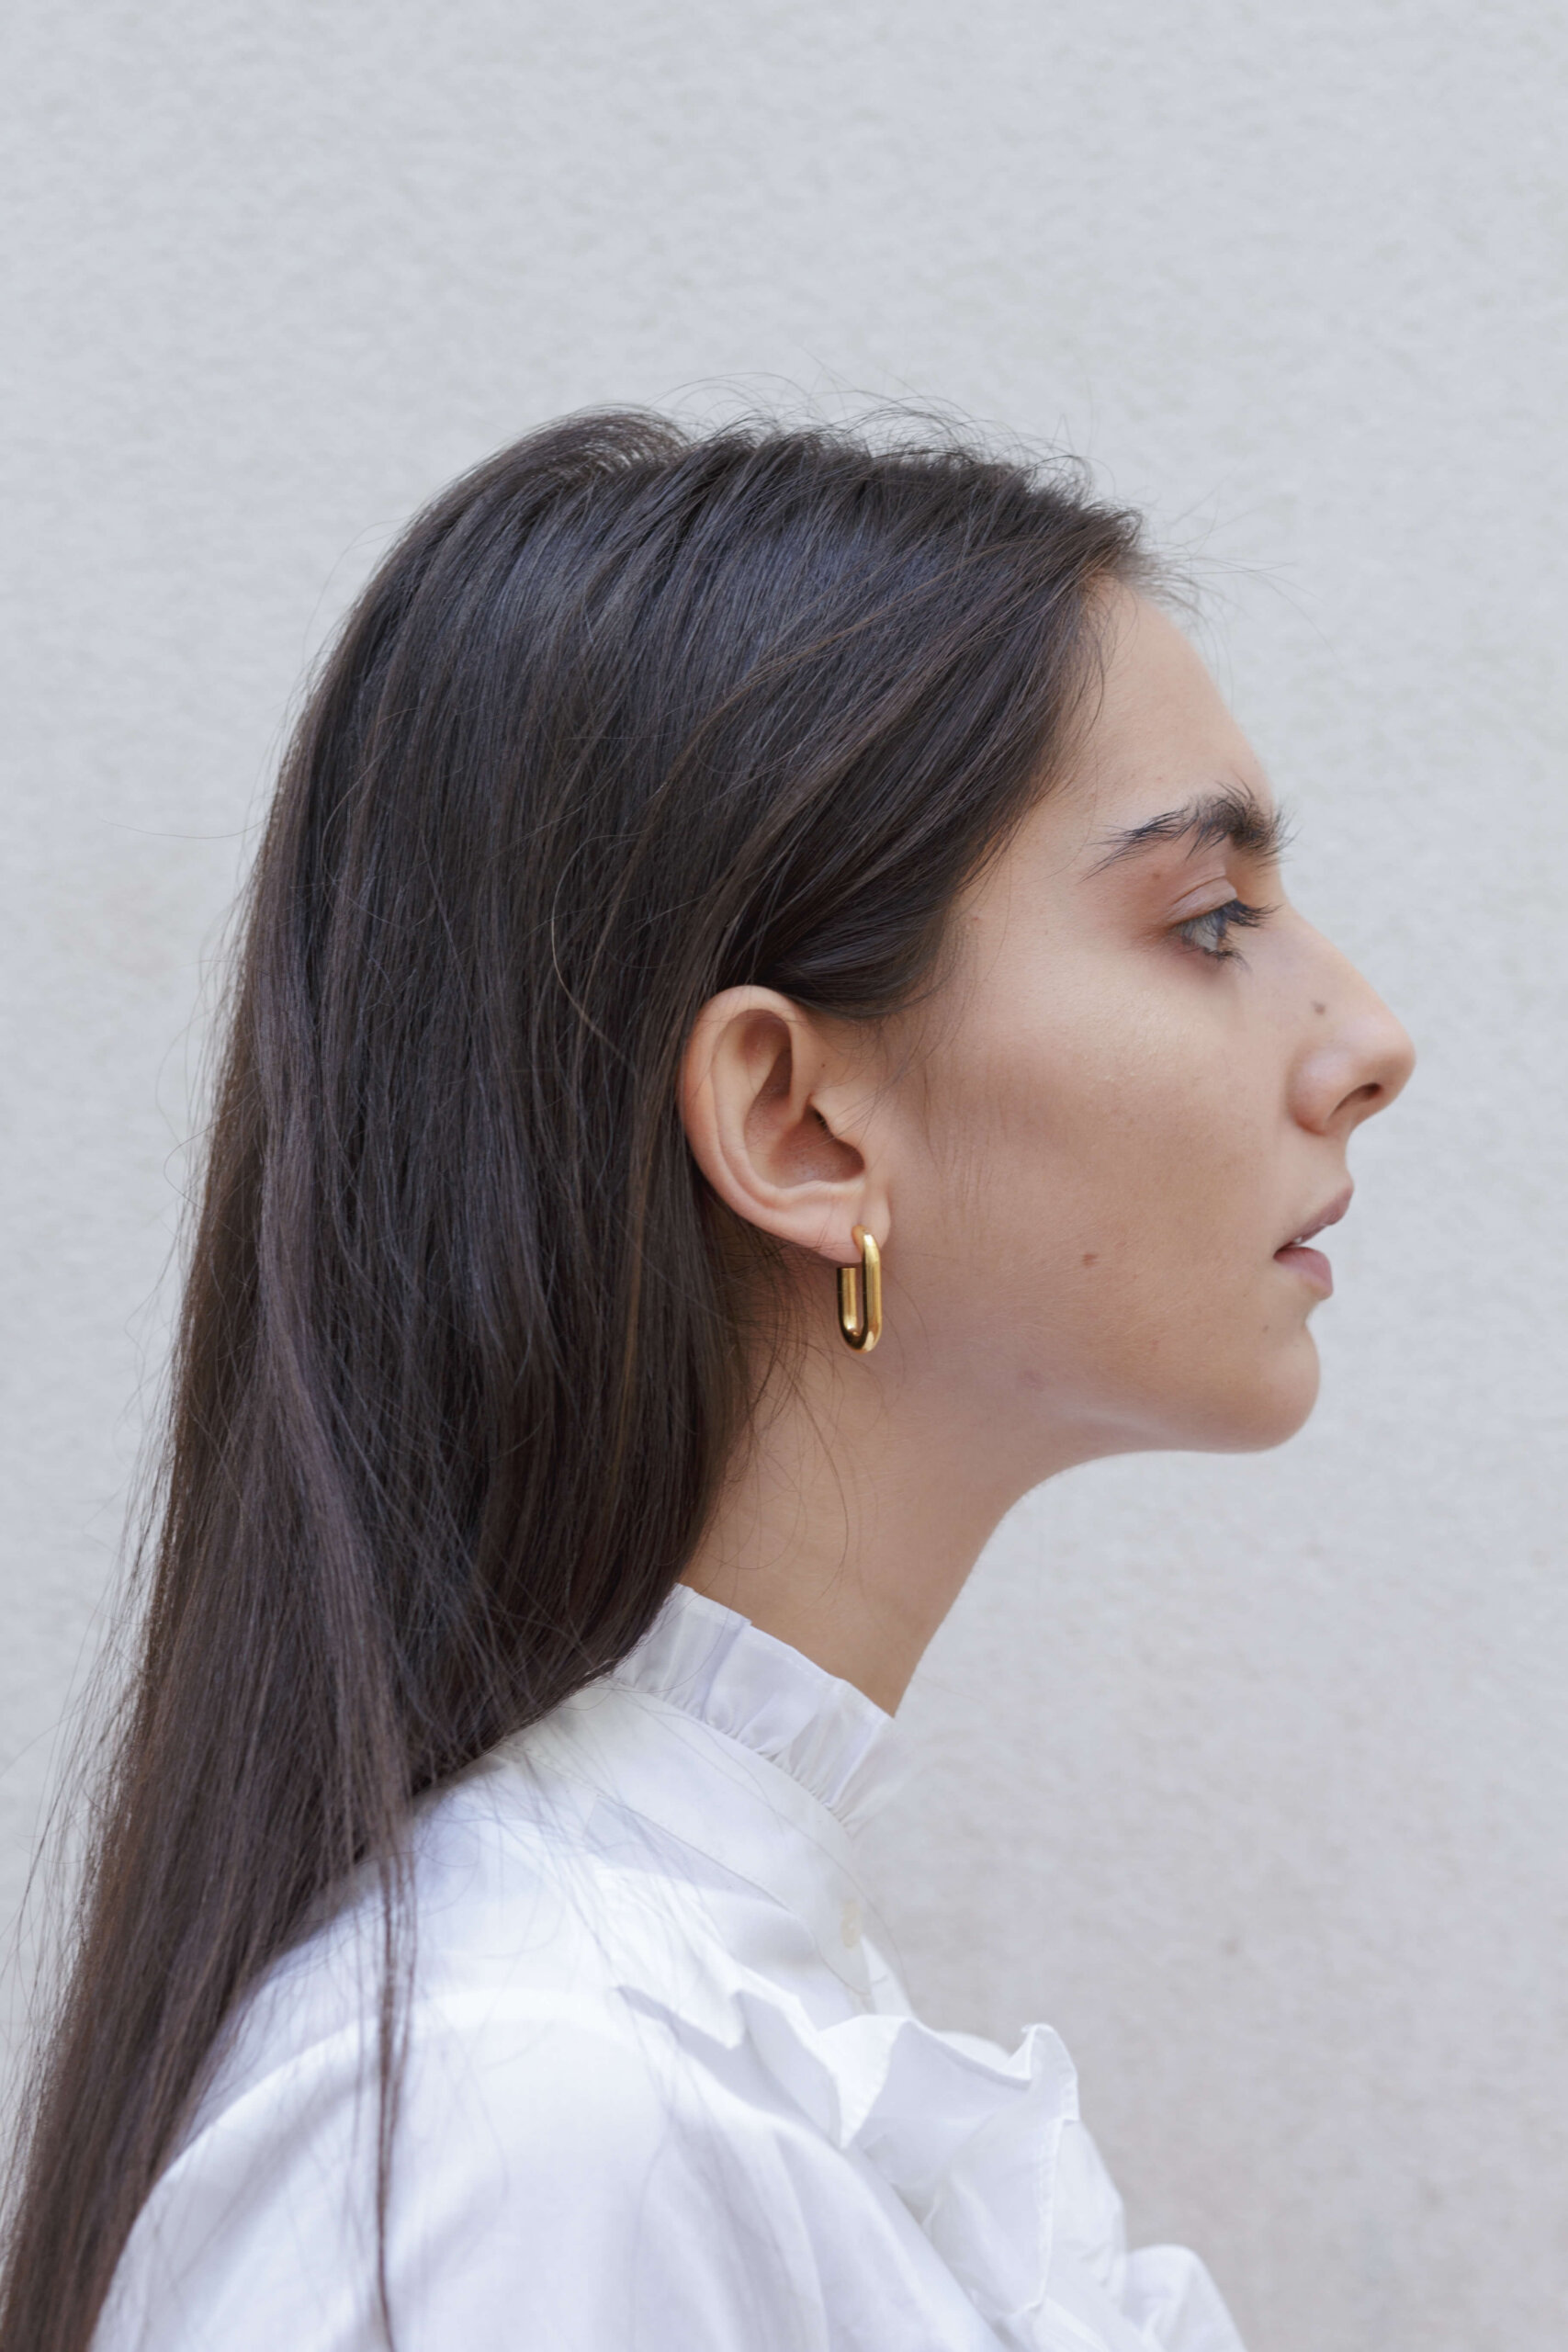 the-medium-golden-link-earring-by-glenda-lopez-lookbook